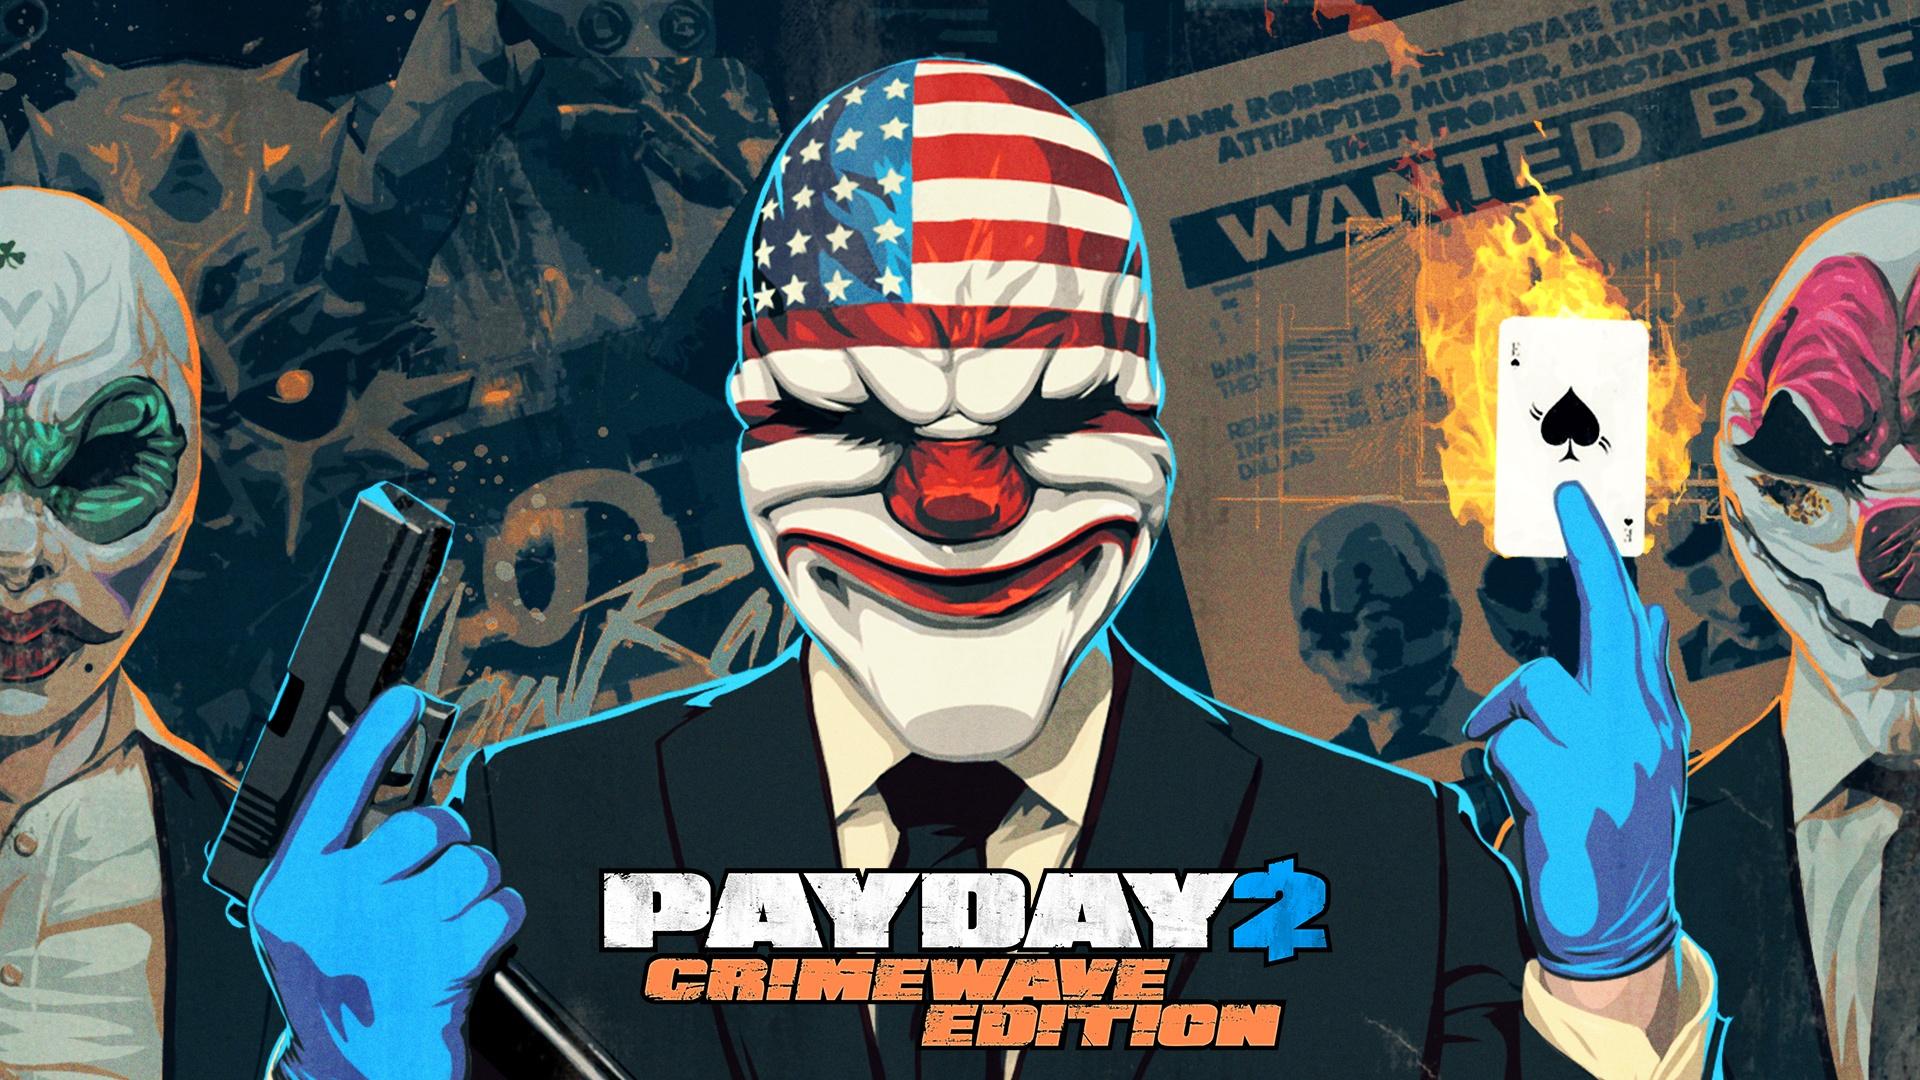 PAYDAY 2: CRIMEWAVE EDITION CHEGA PARA PS4 E XBOX ONE POR R$ 200 Crimewave01_c4kf